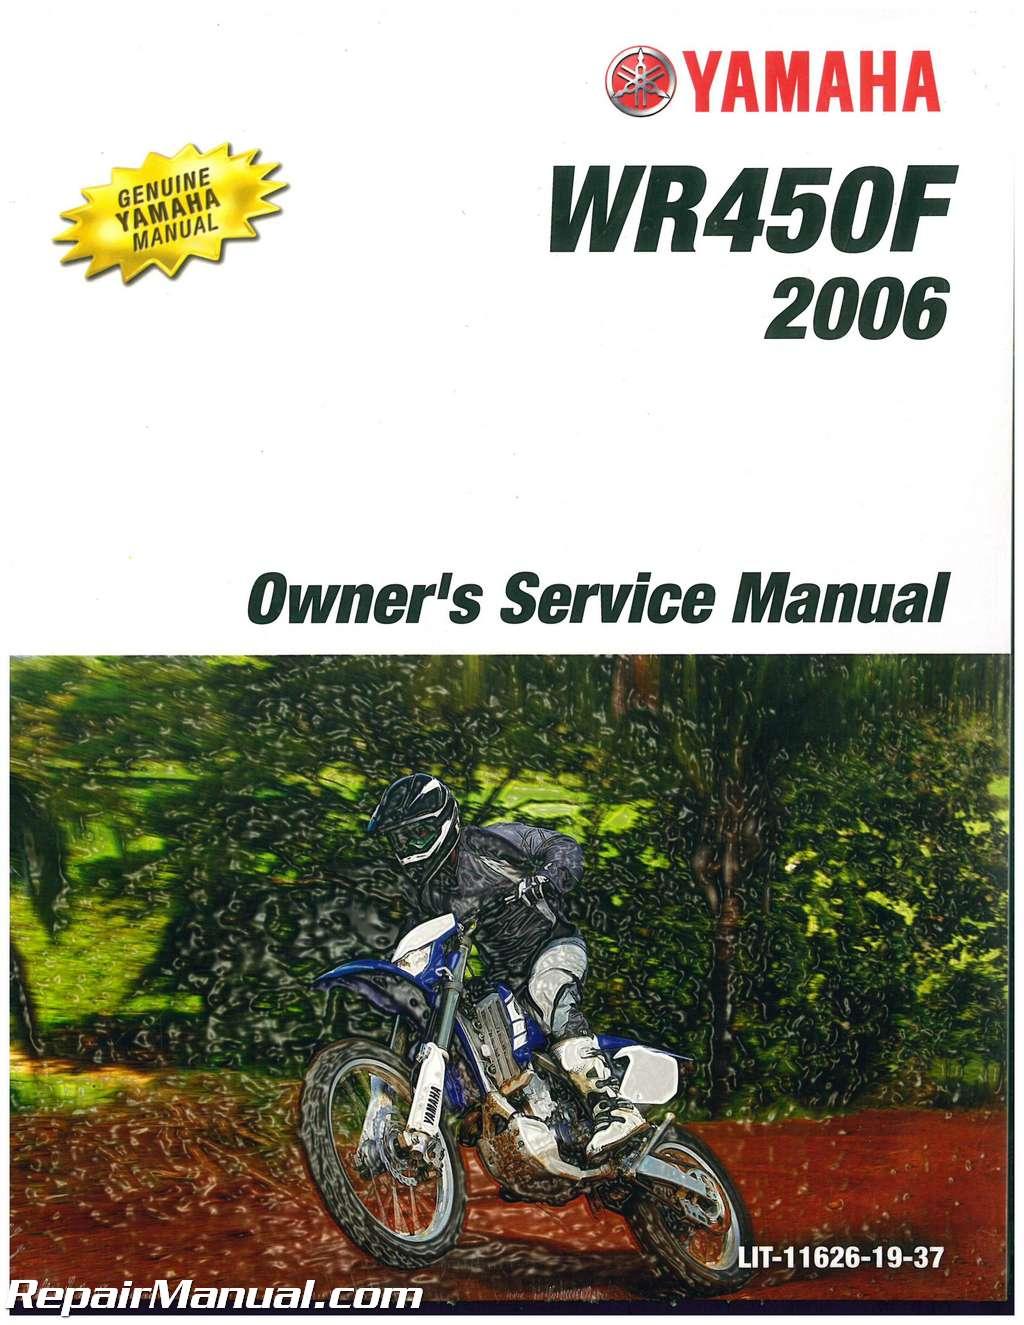 ratings u0026 reviews Array - 2006 yamaha wr450f motorcycle owners service  manual rh repairmanual ...